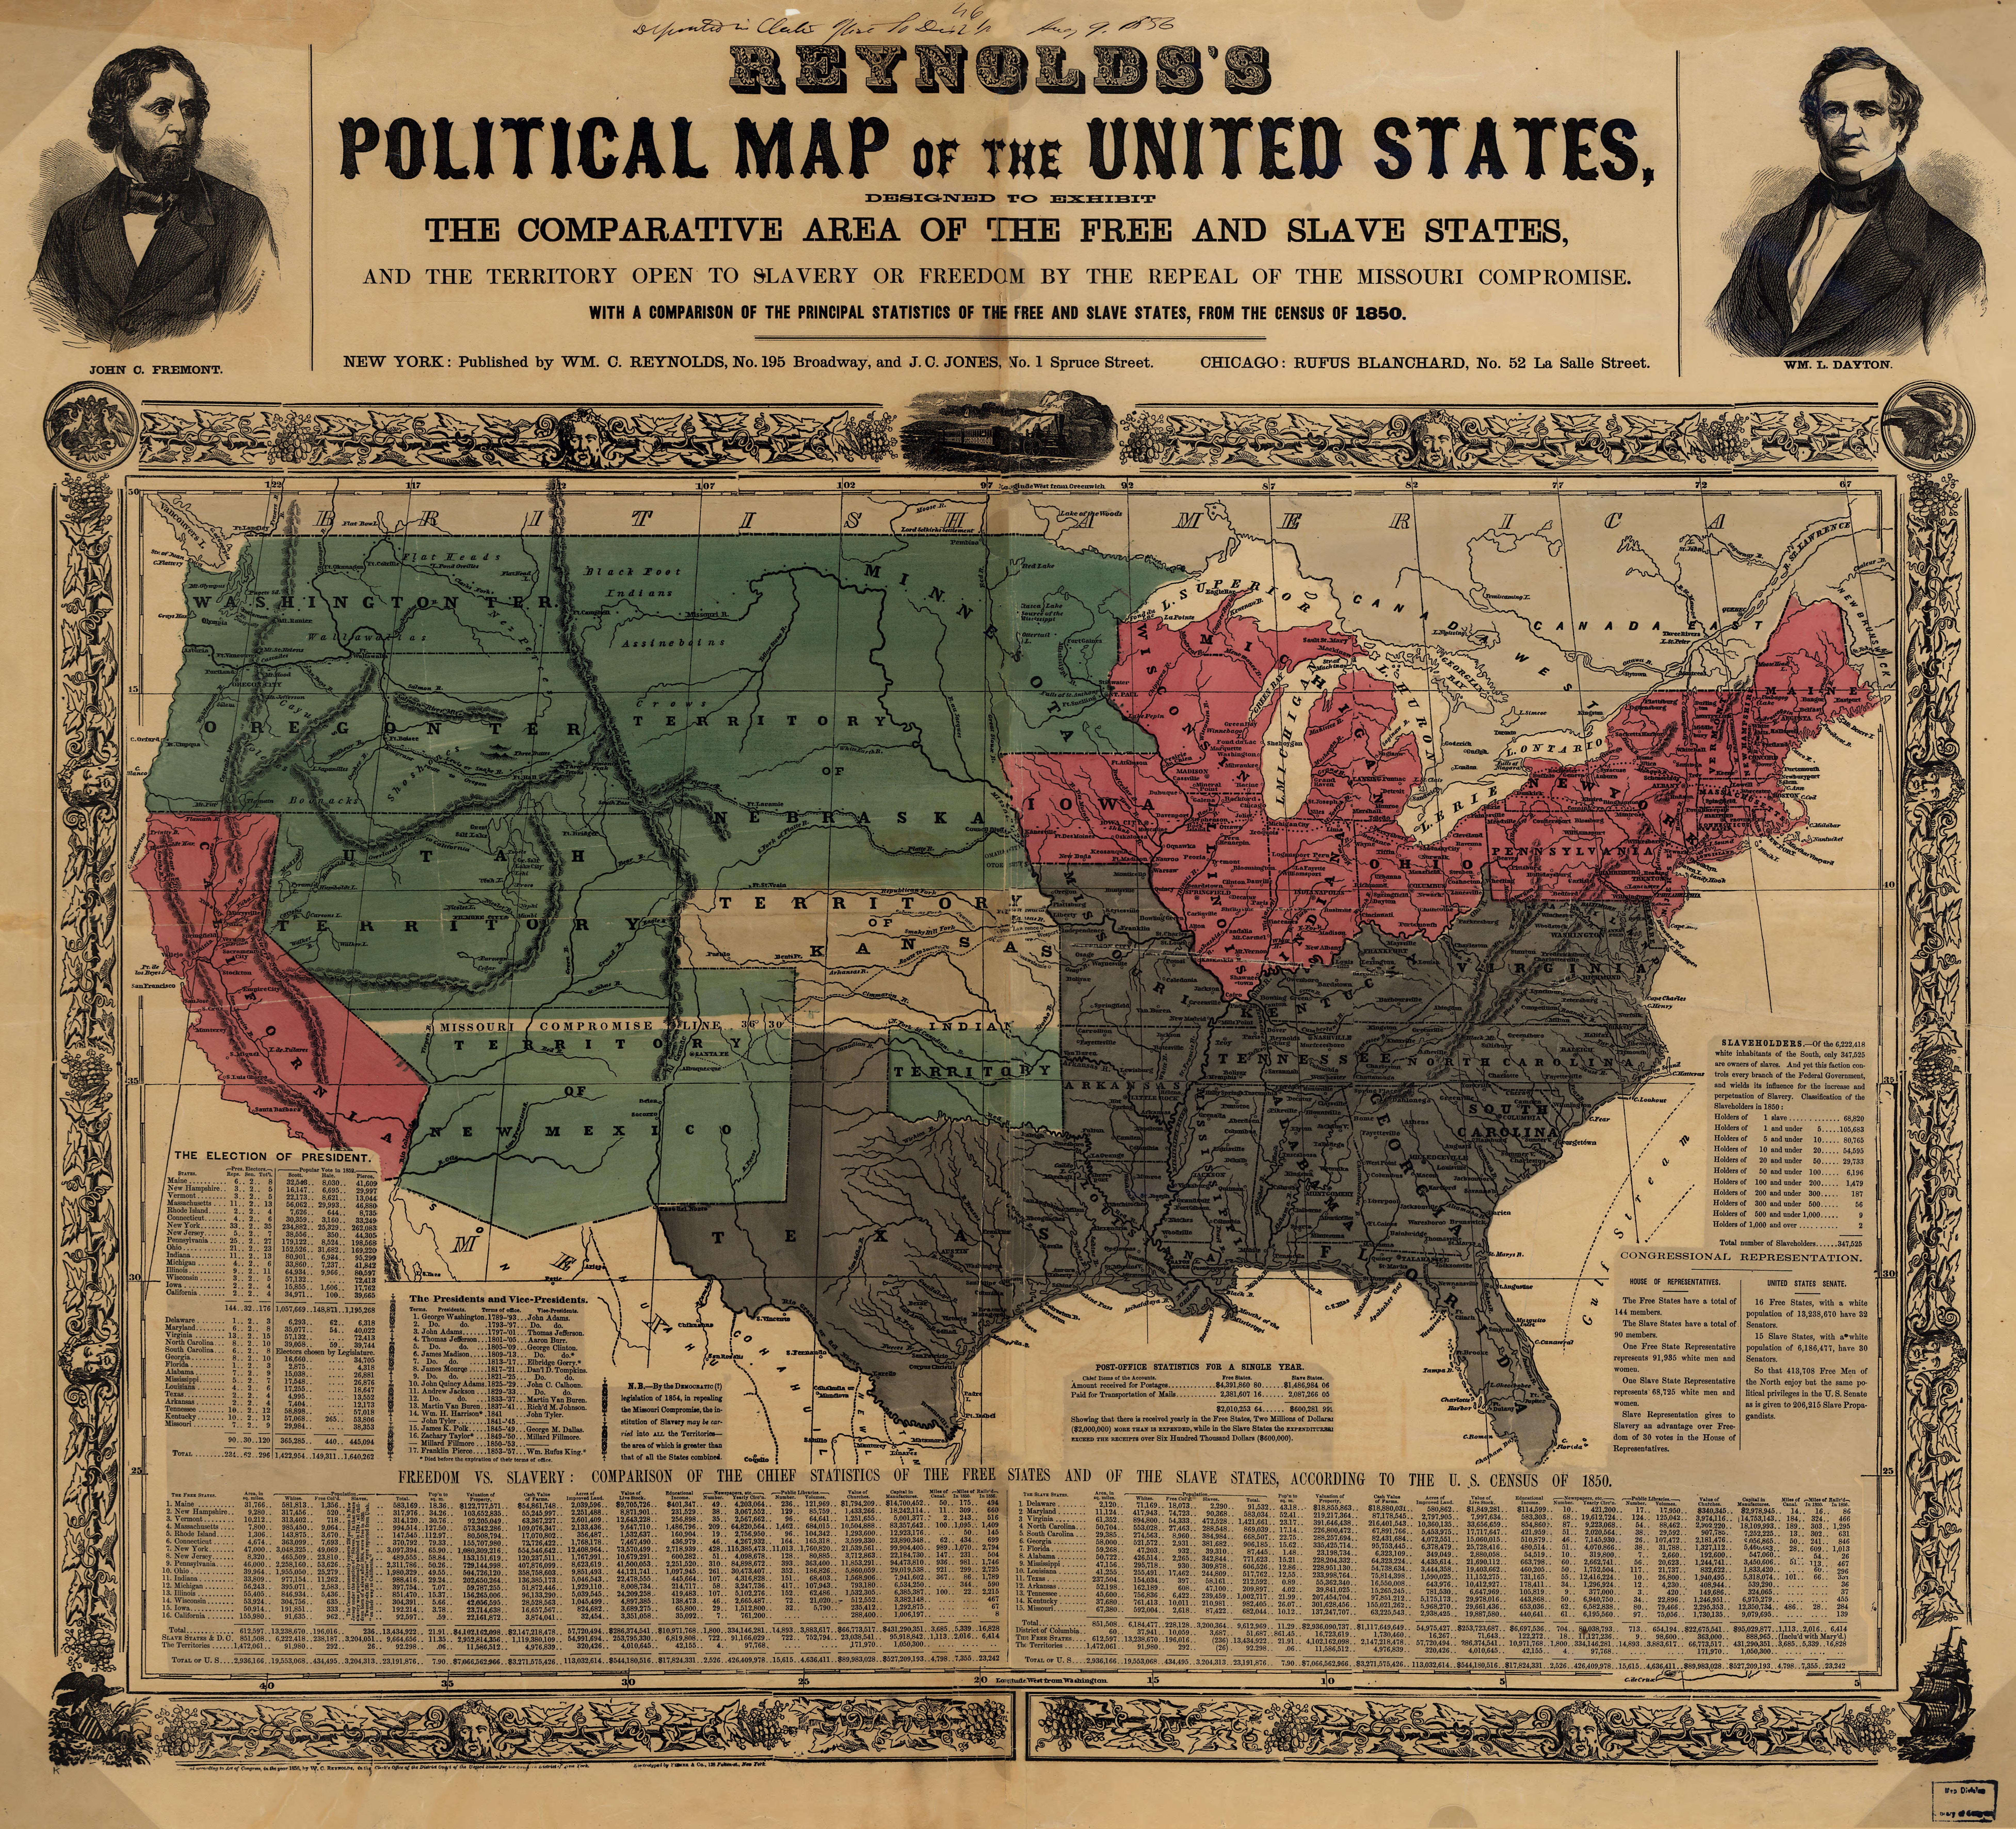 ... Kansas Nebraska Act . Title parts it1854 kansas nebraska referred to